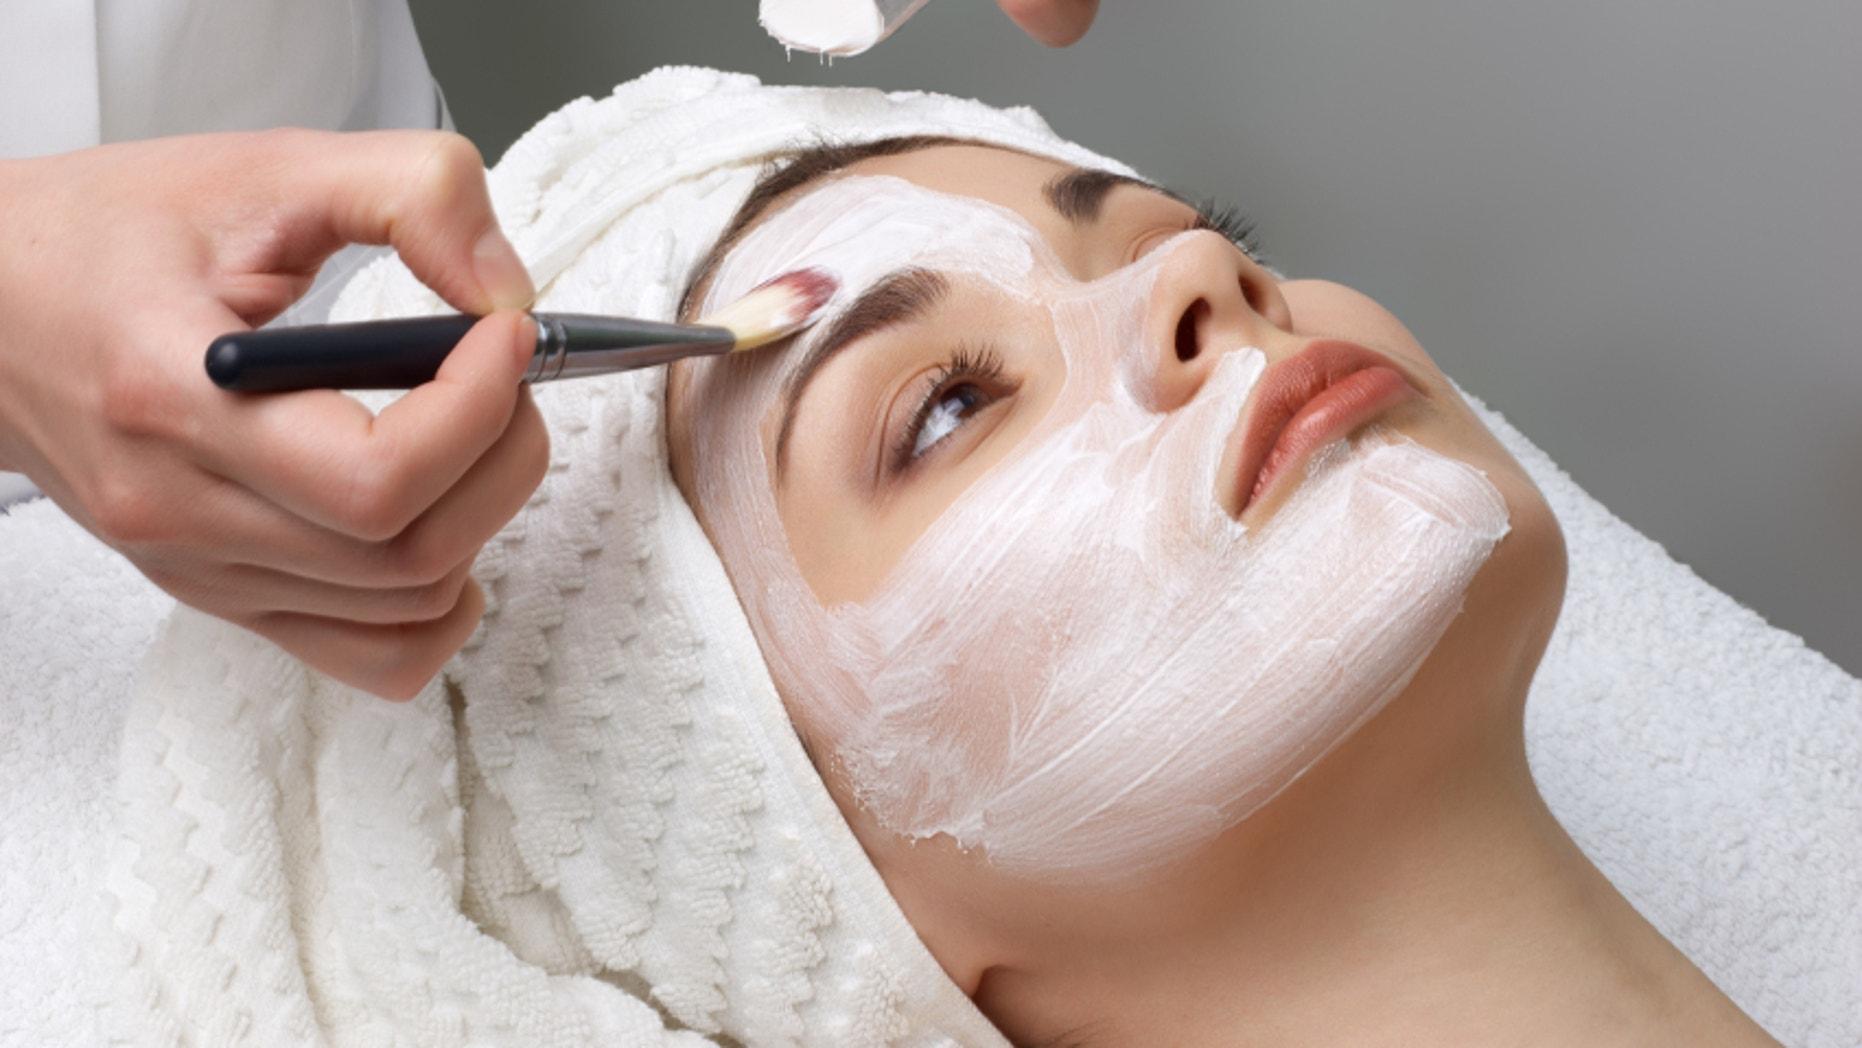 beauty salon series. facial mask applying